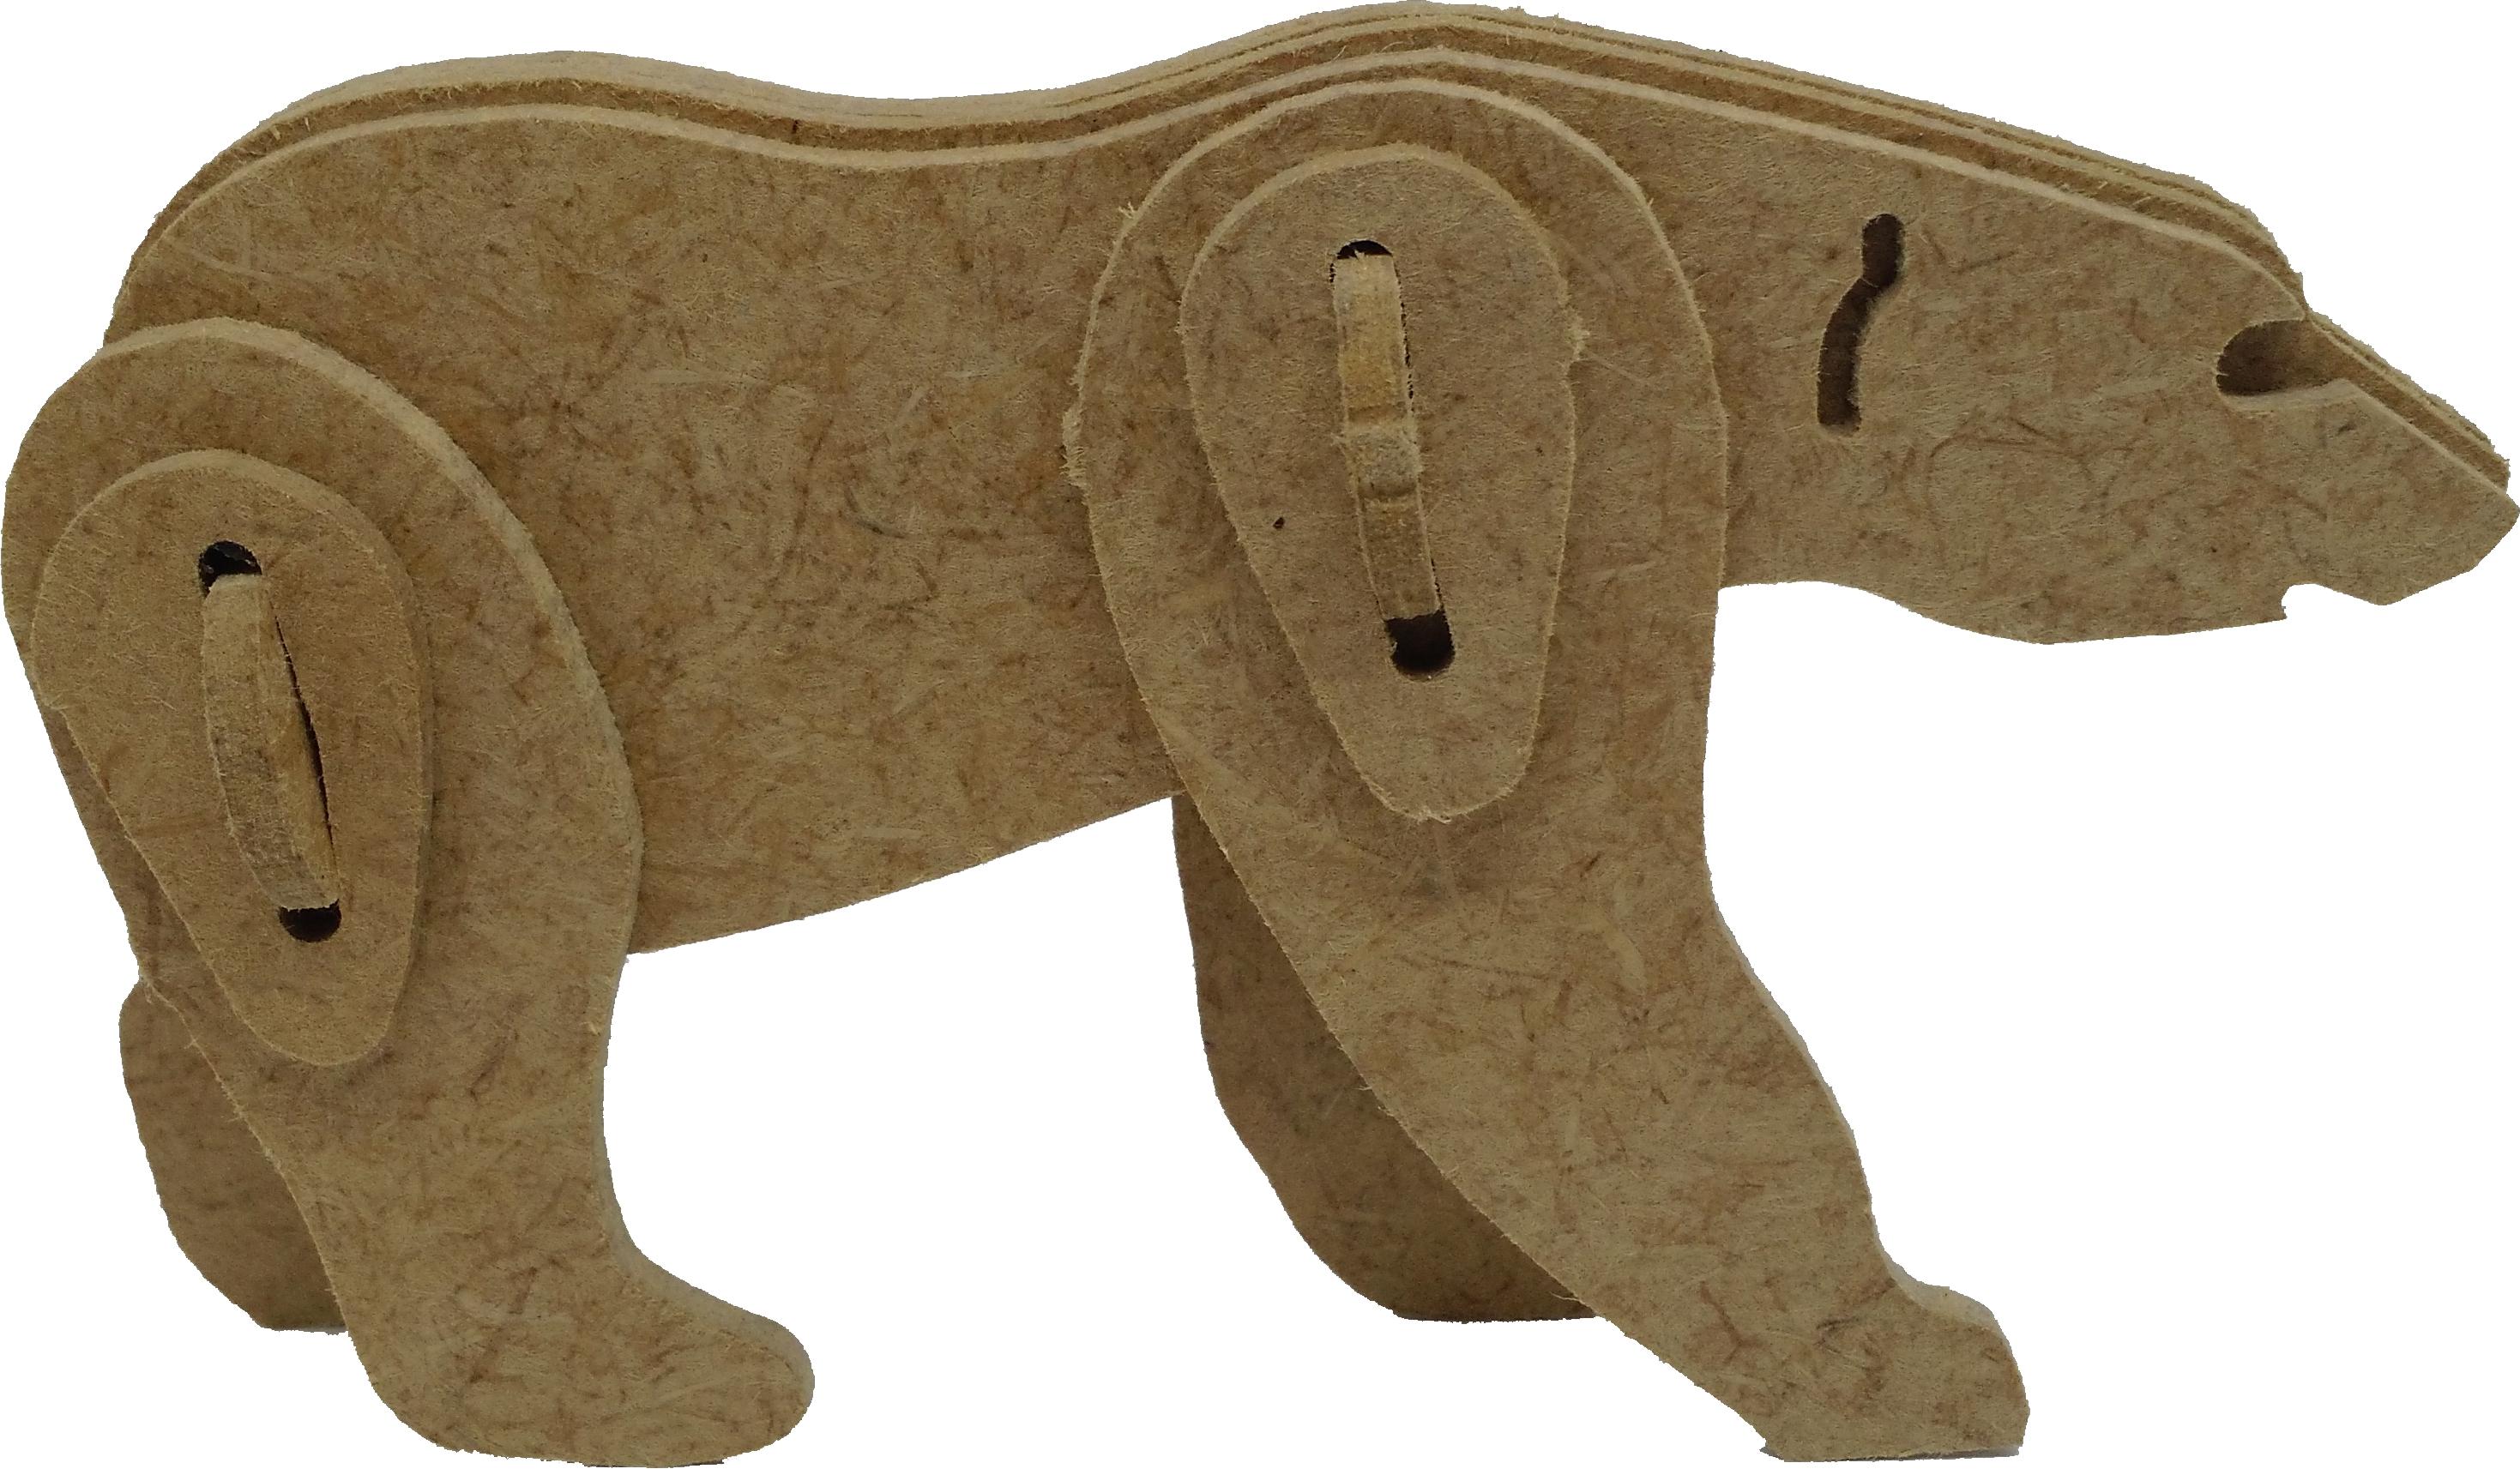 Kir 3D Urso